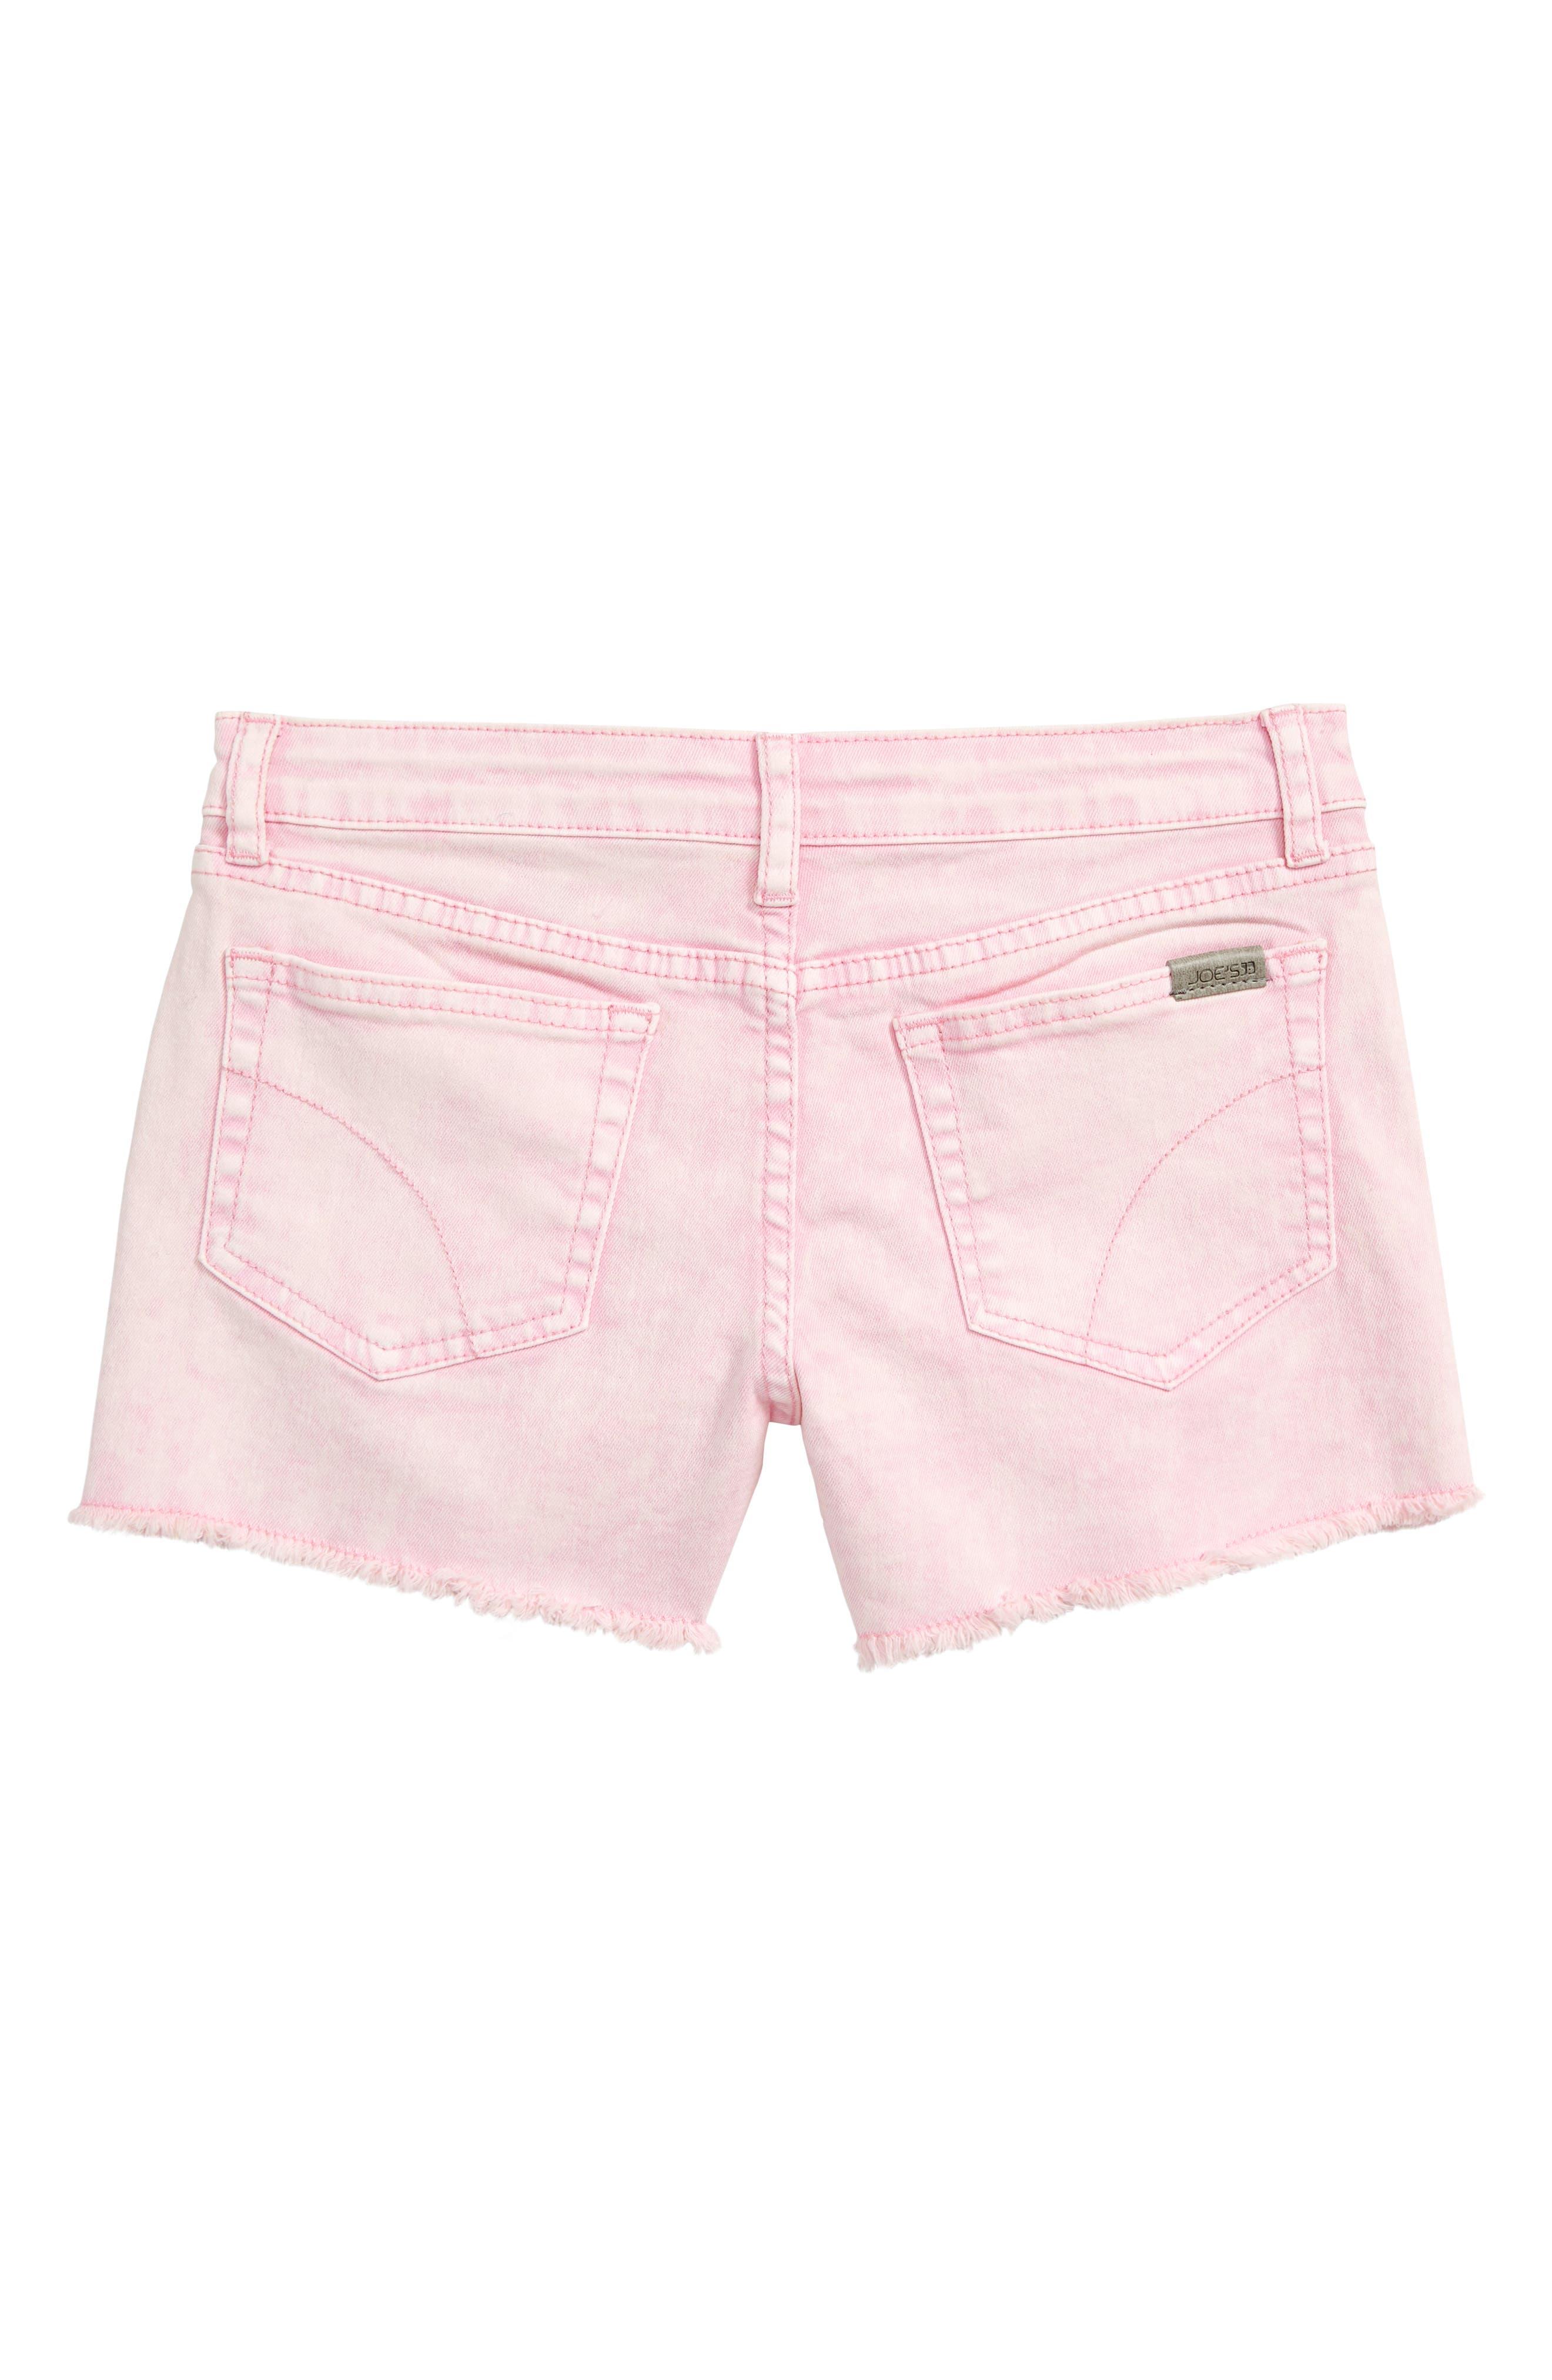 JOE'S, The Markie Cutoff Denim Shorts, Alternate thumbnail 2, color, PRISM PINK